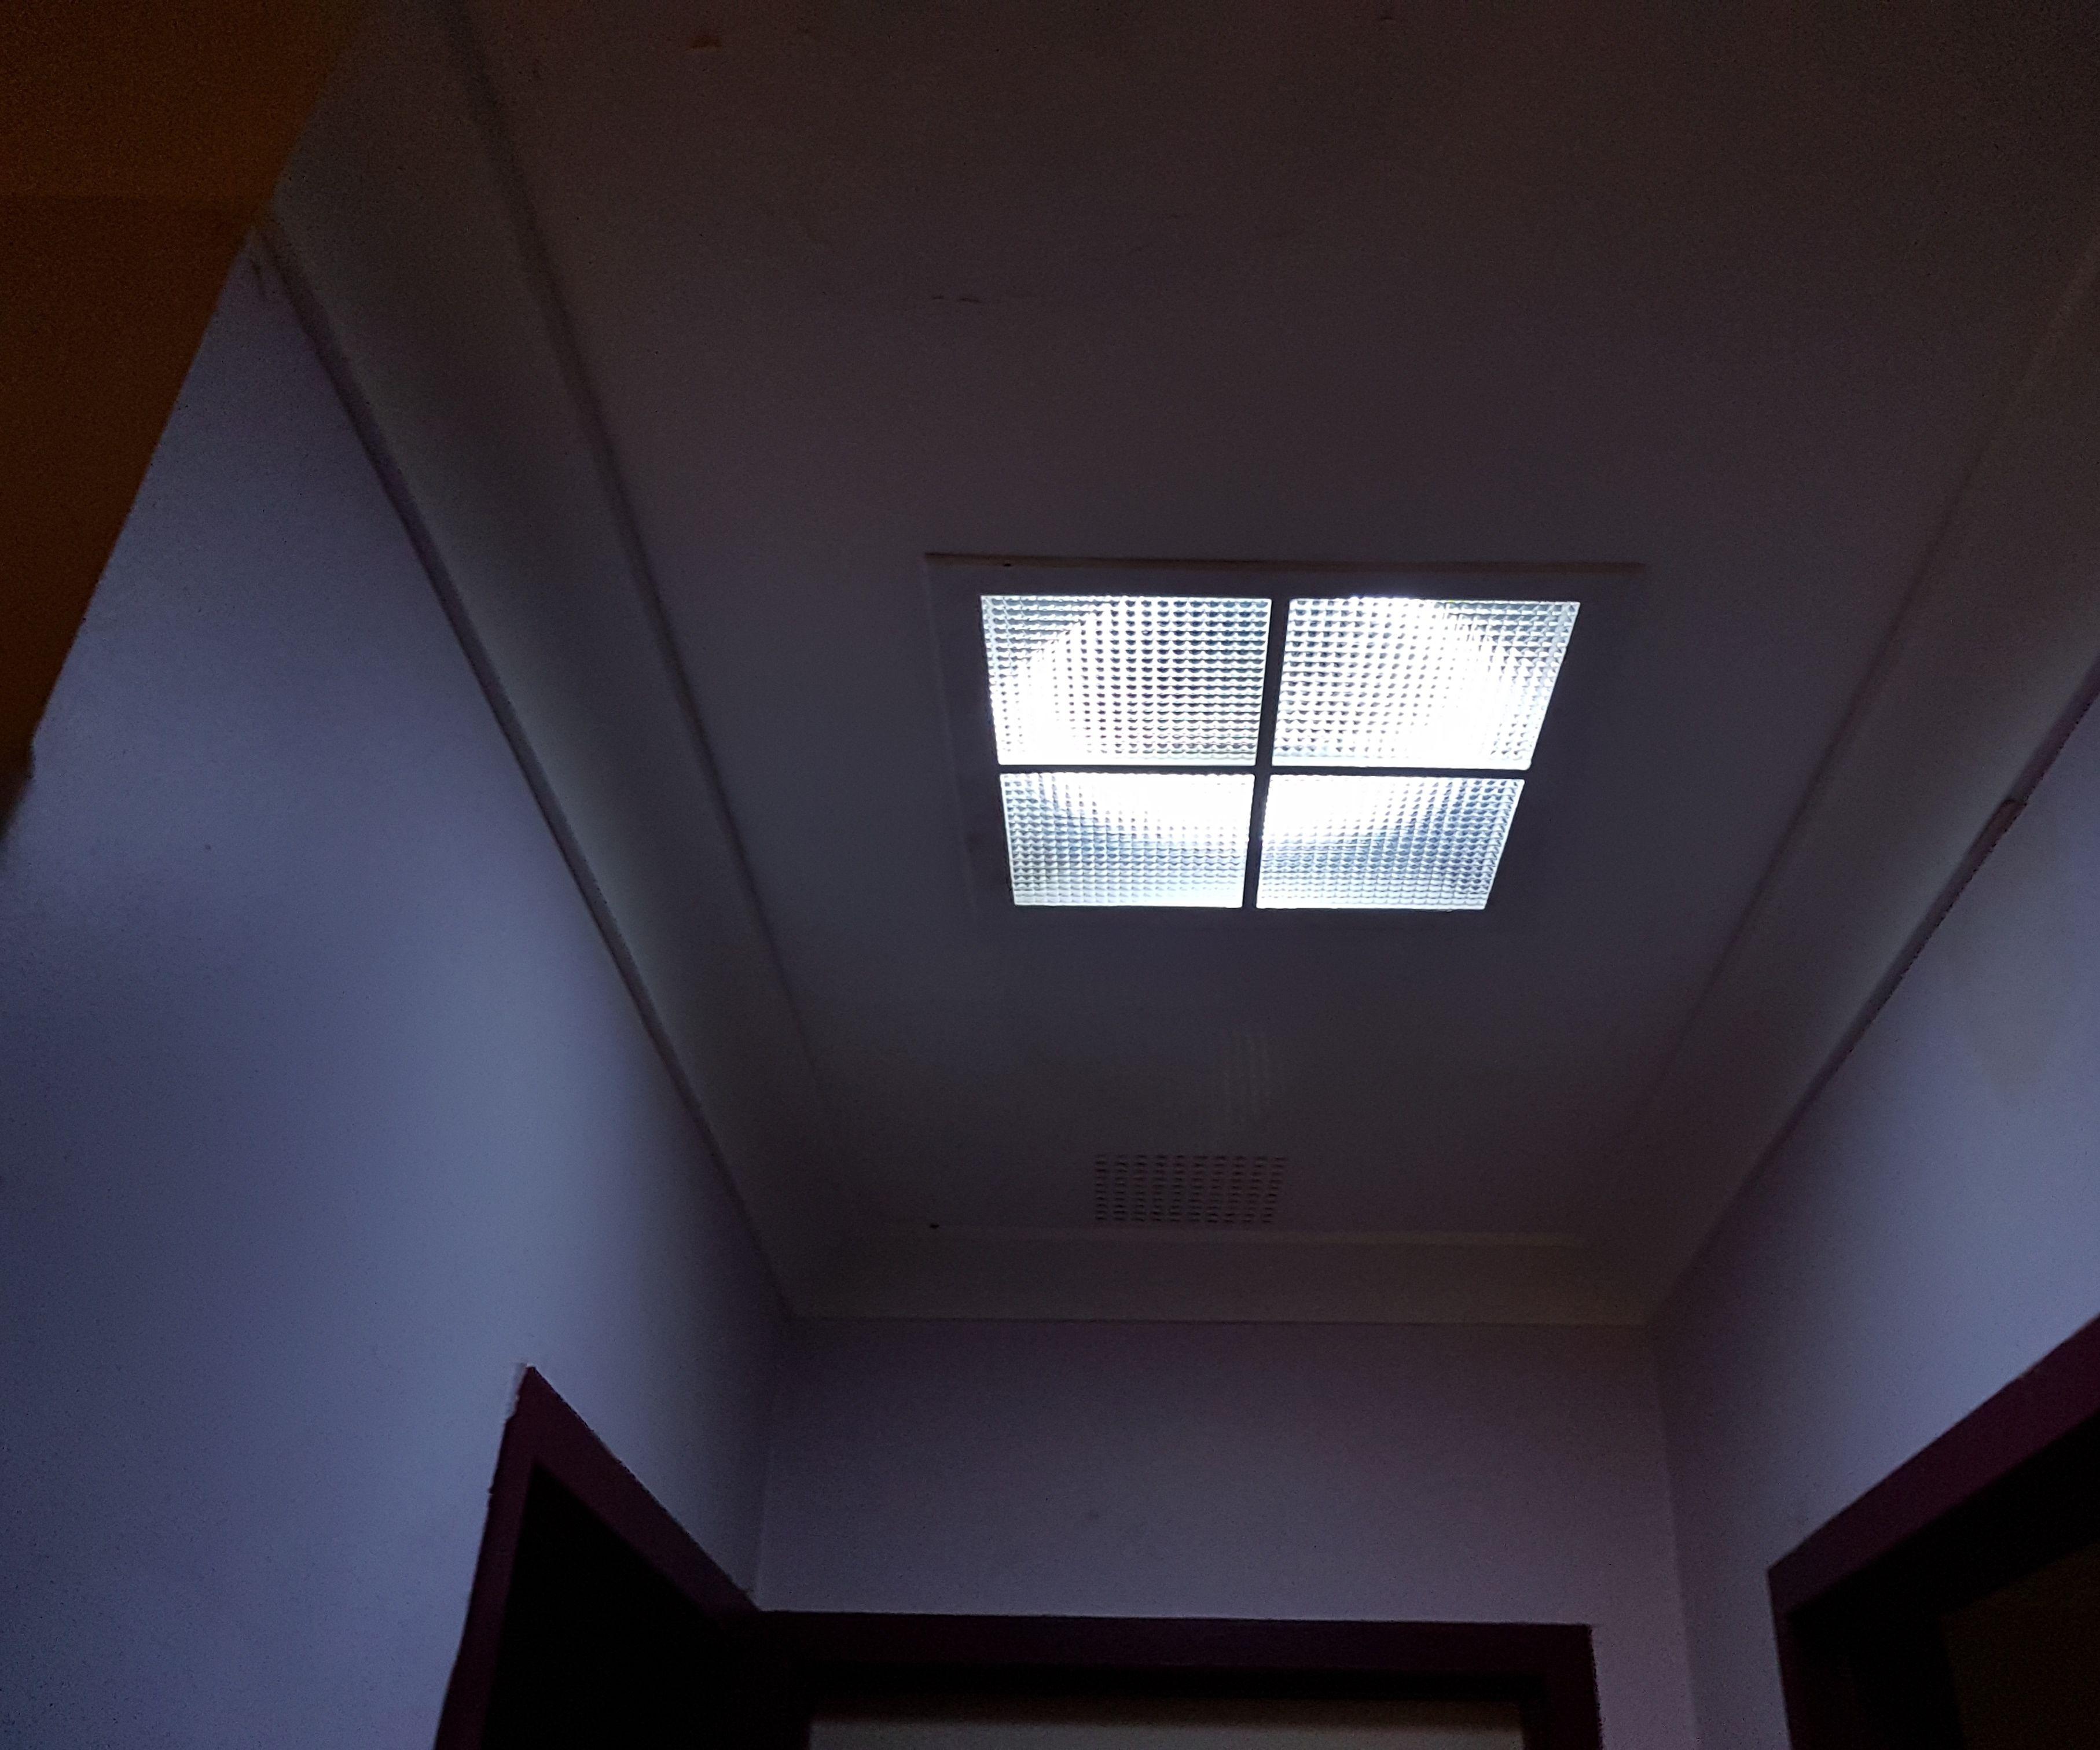 LED Skylight That Is Solar Powered - Retrofit